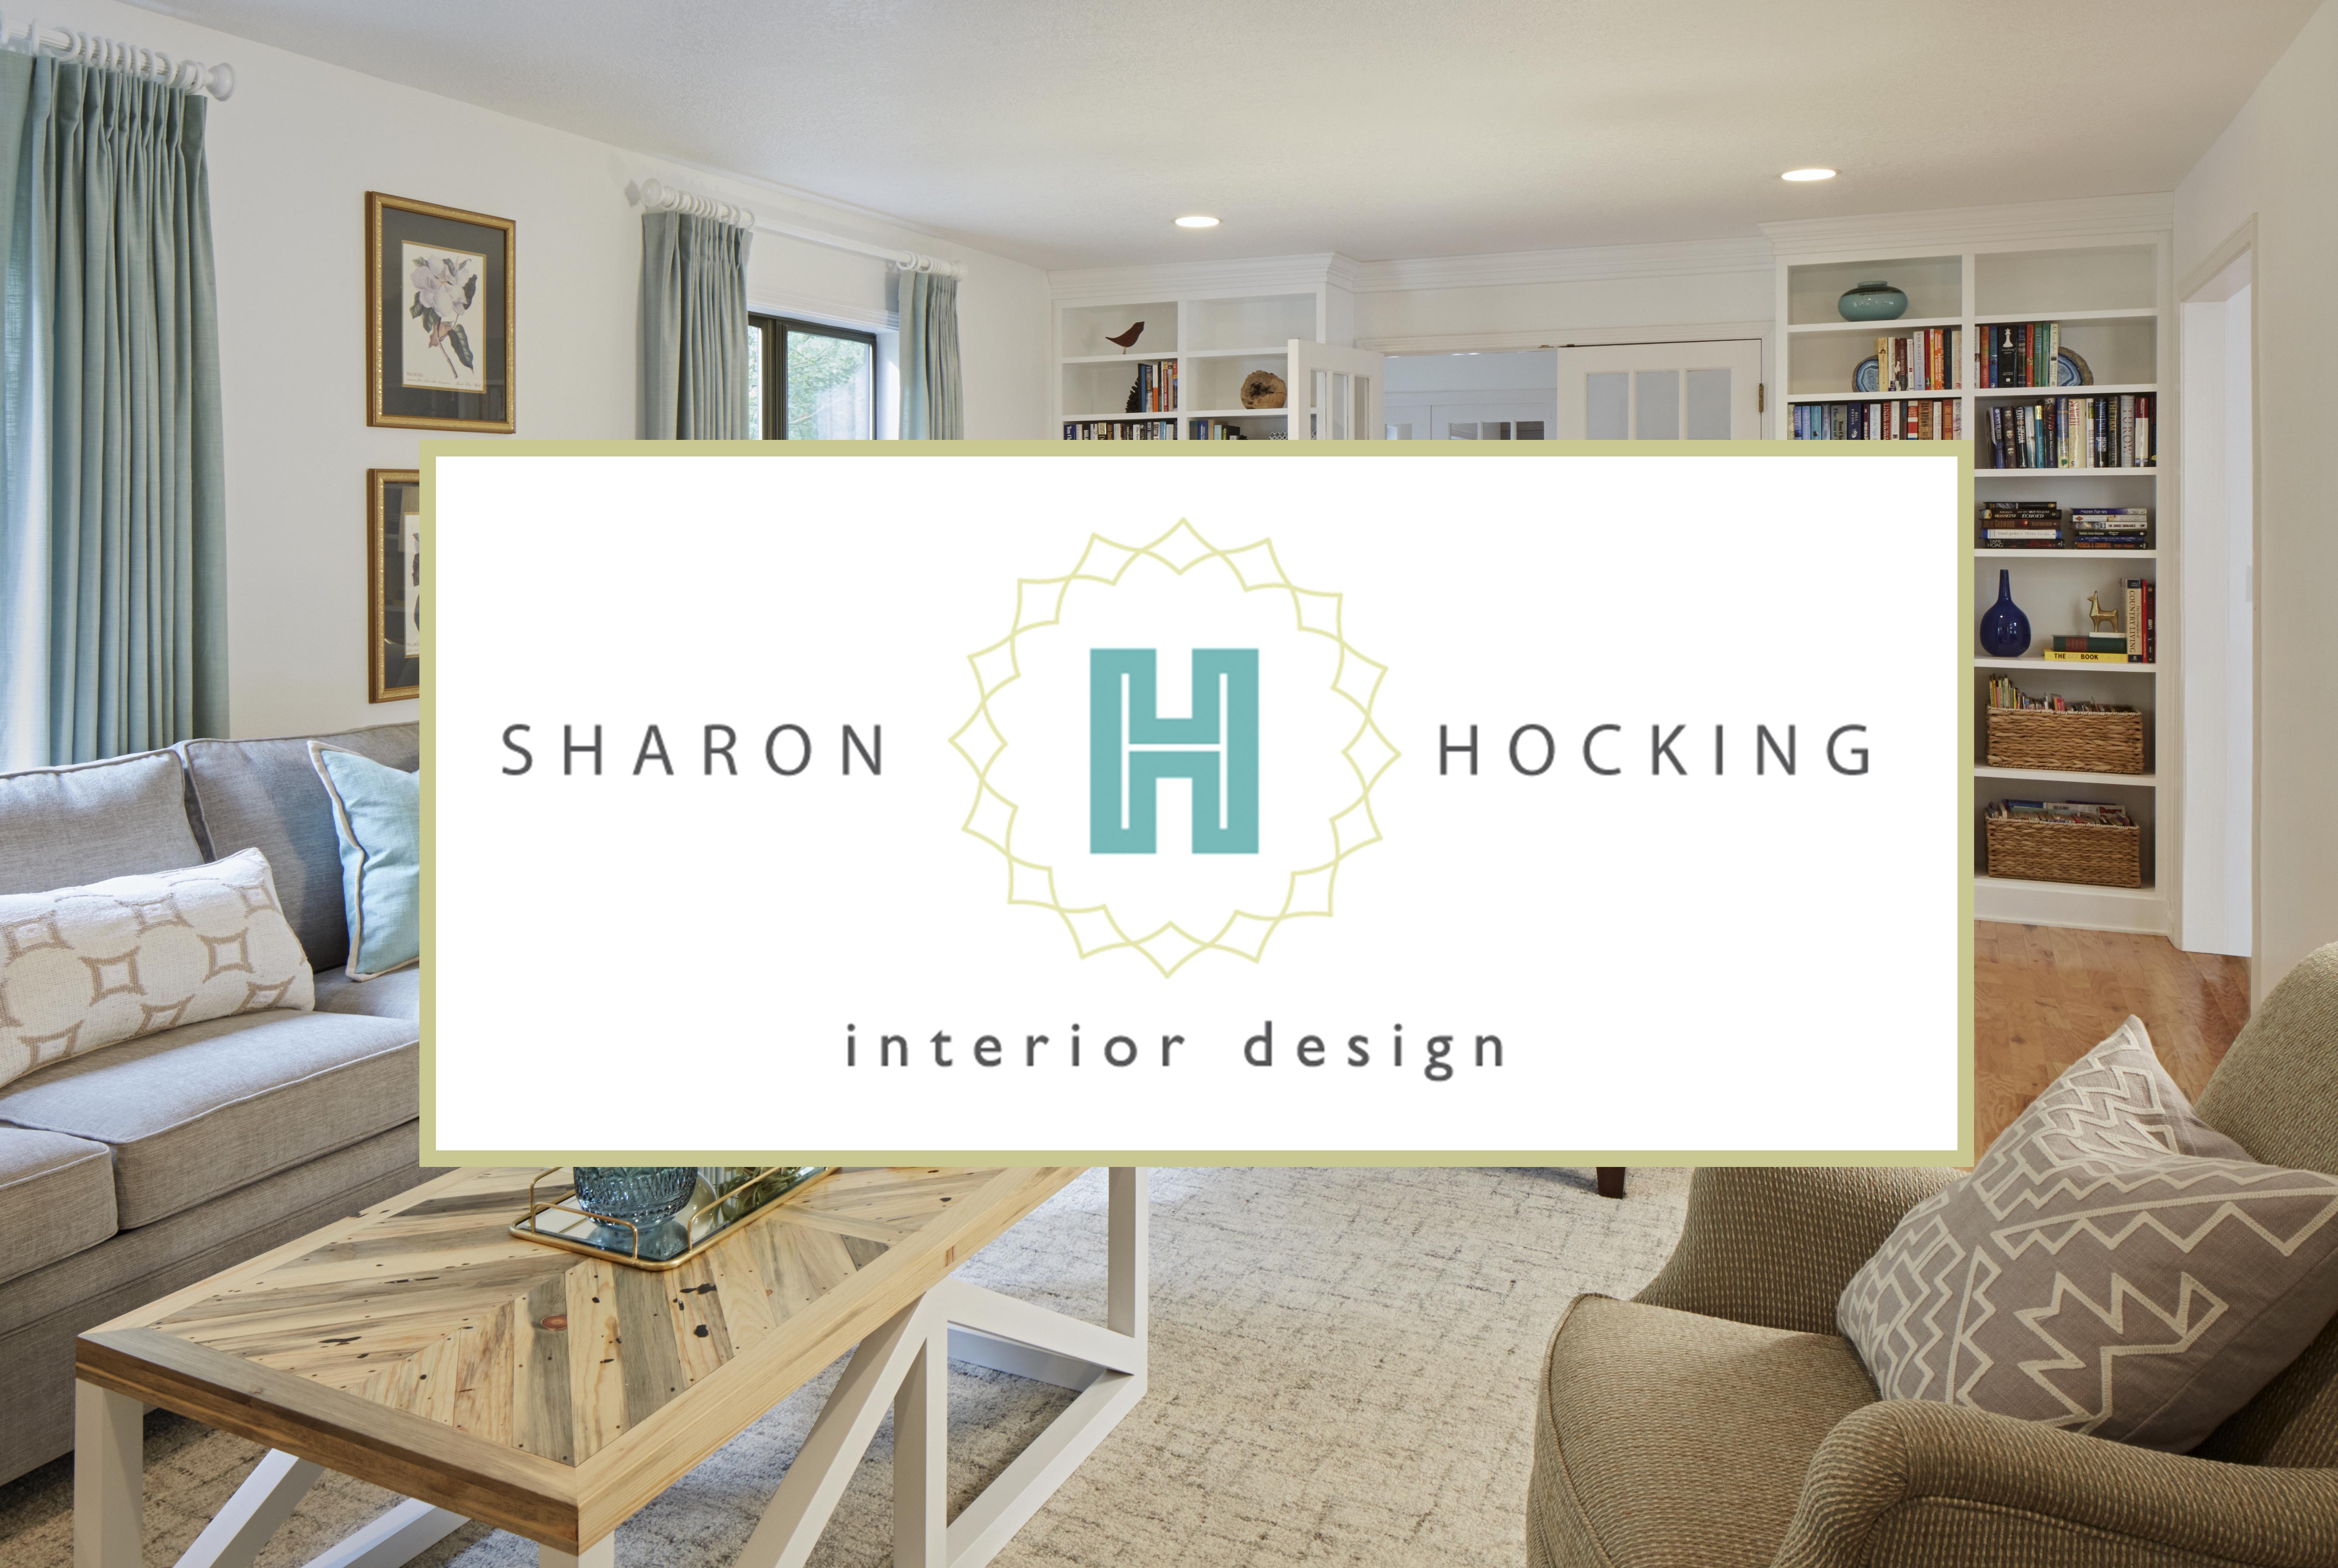 sharon hocking interior design interior decor portland or - Interior Designs Home